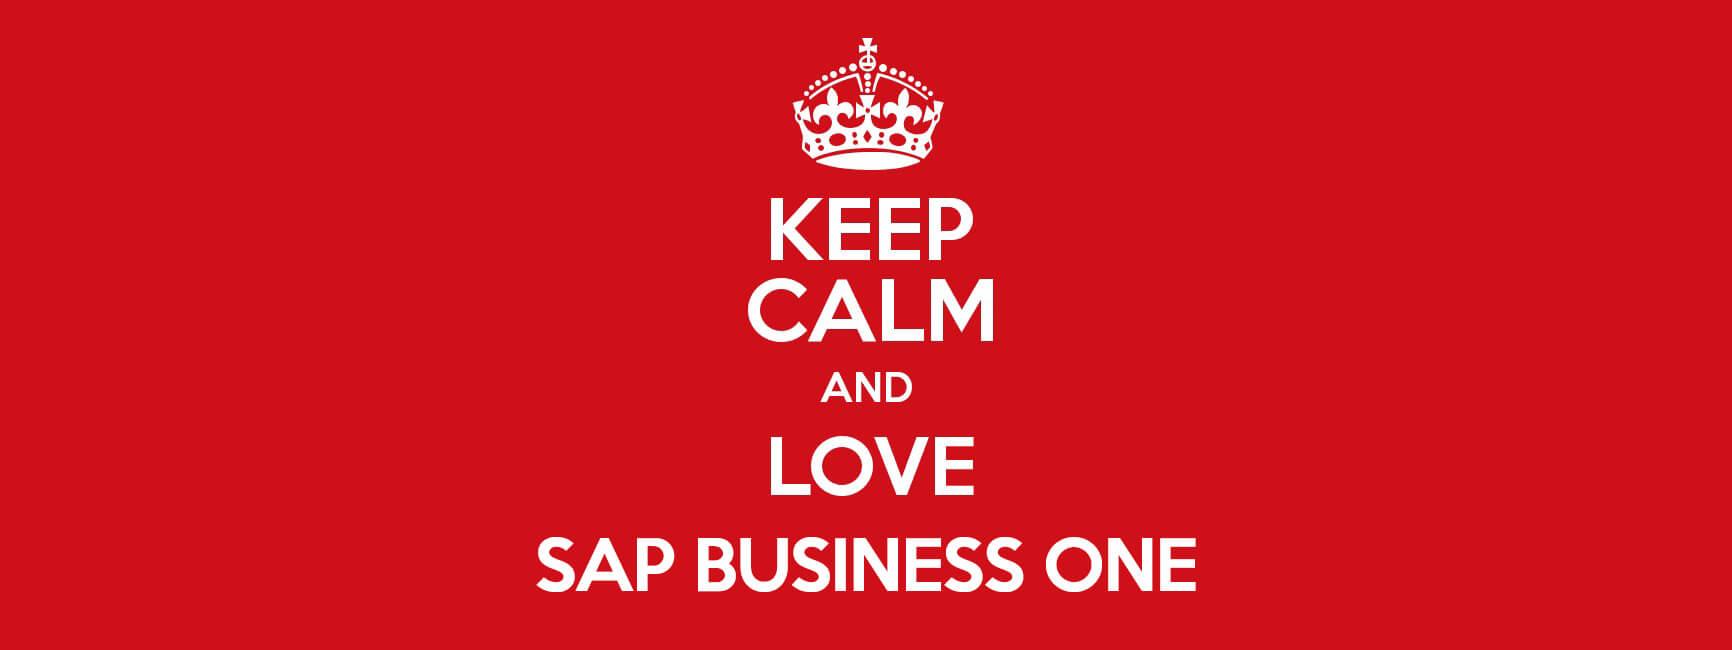 amor-sap-business-one-corponet